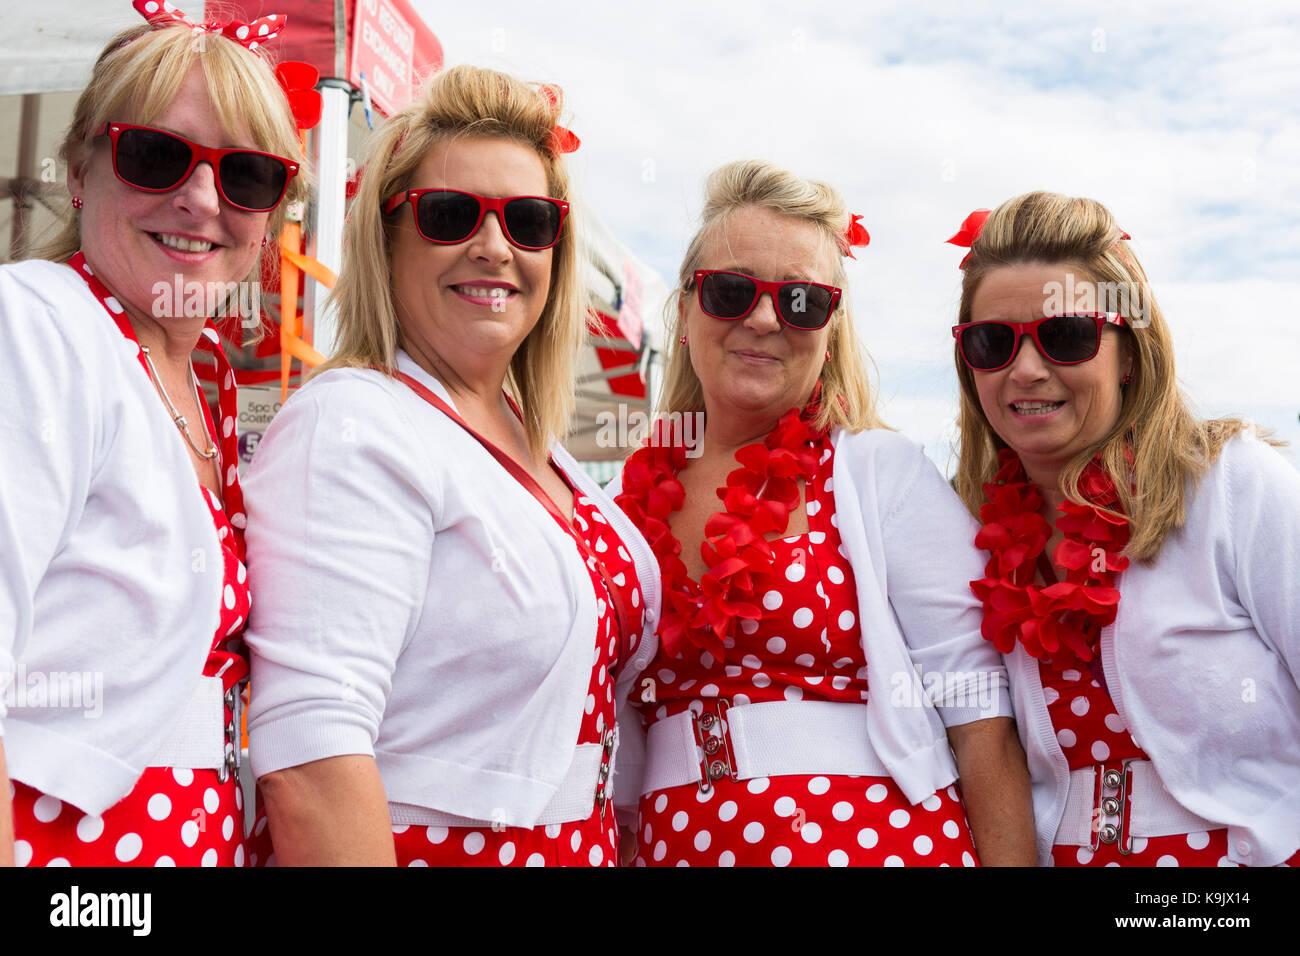 Wendy amis Lester, Sonia Sullivan, Gaynor Jones et Debbie Lee à l'Elvis Presley de Porthcawl Festival, Photo Stock